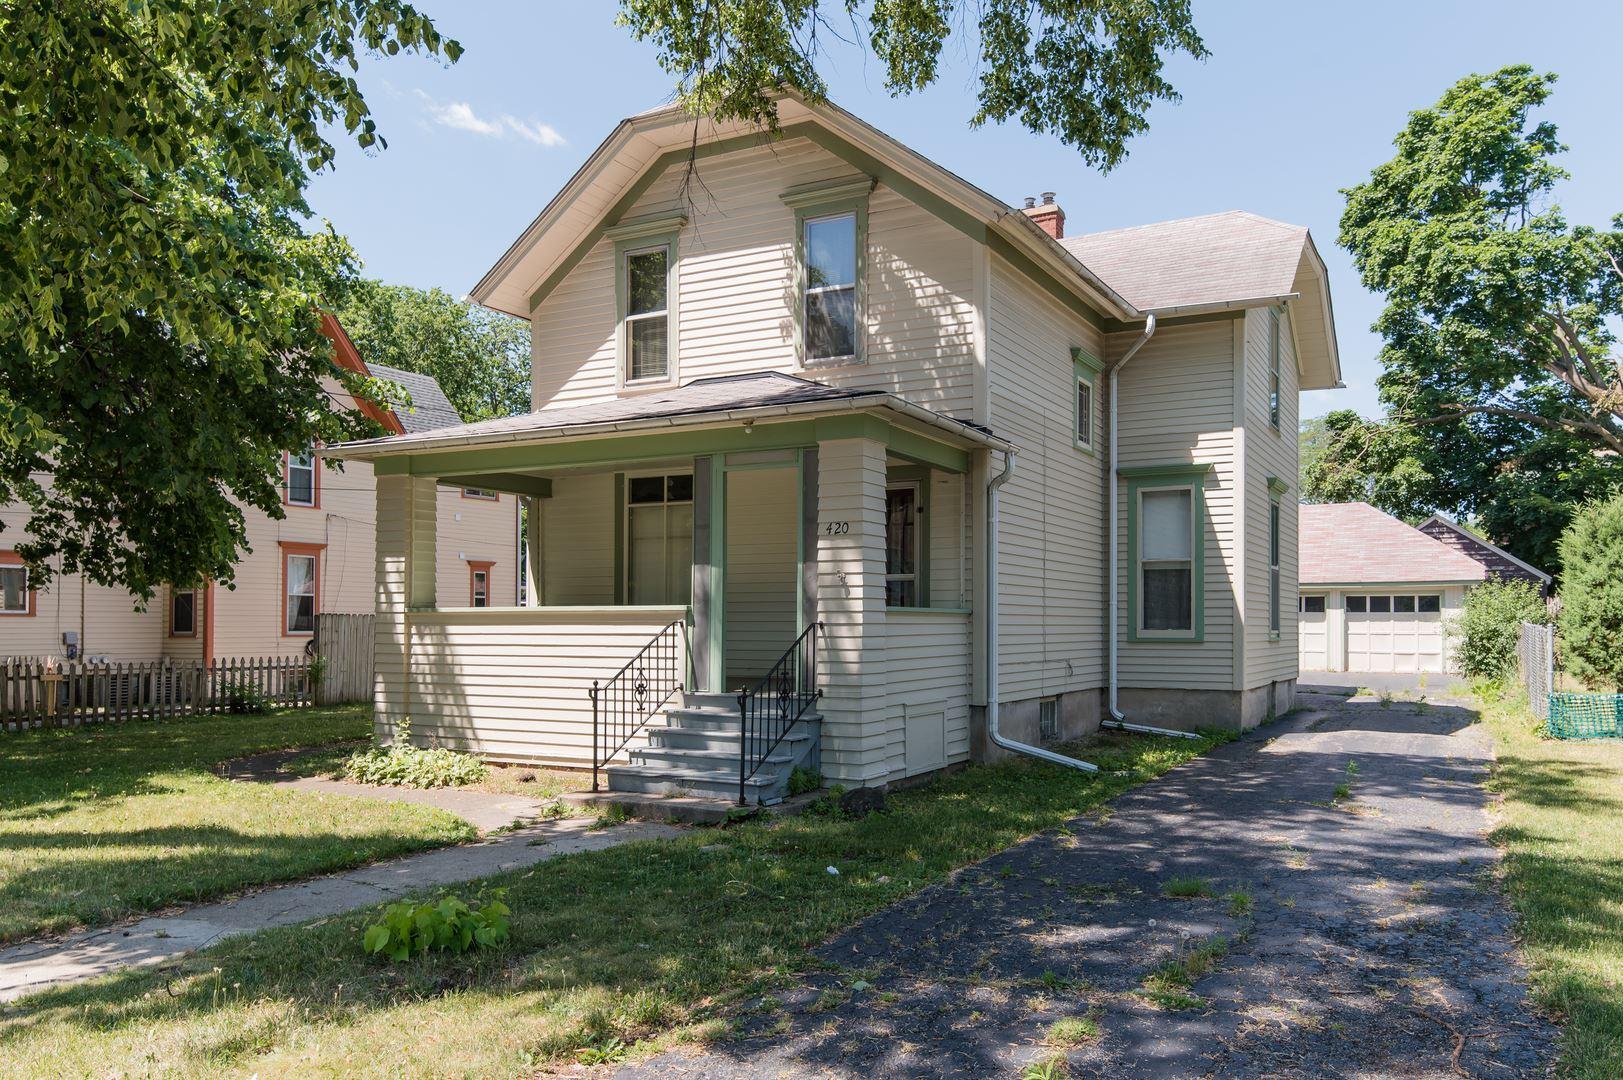 420 S Liberty Street, Elgin, IL 60120 - #: 11125018